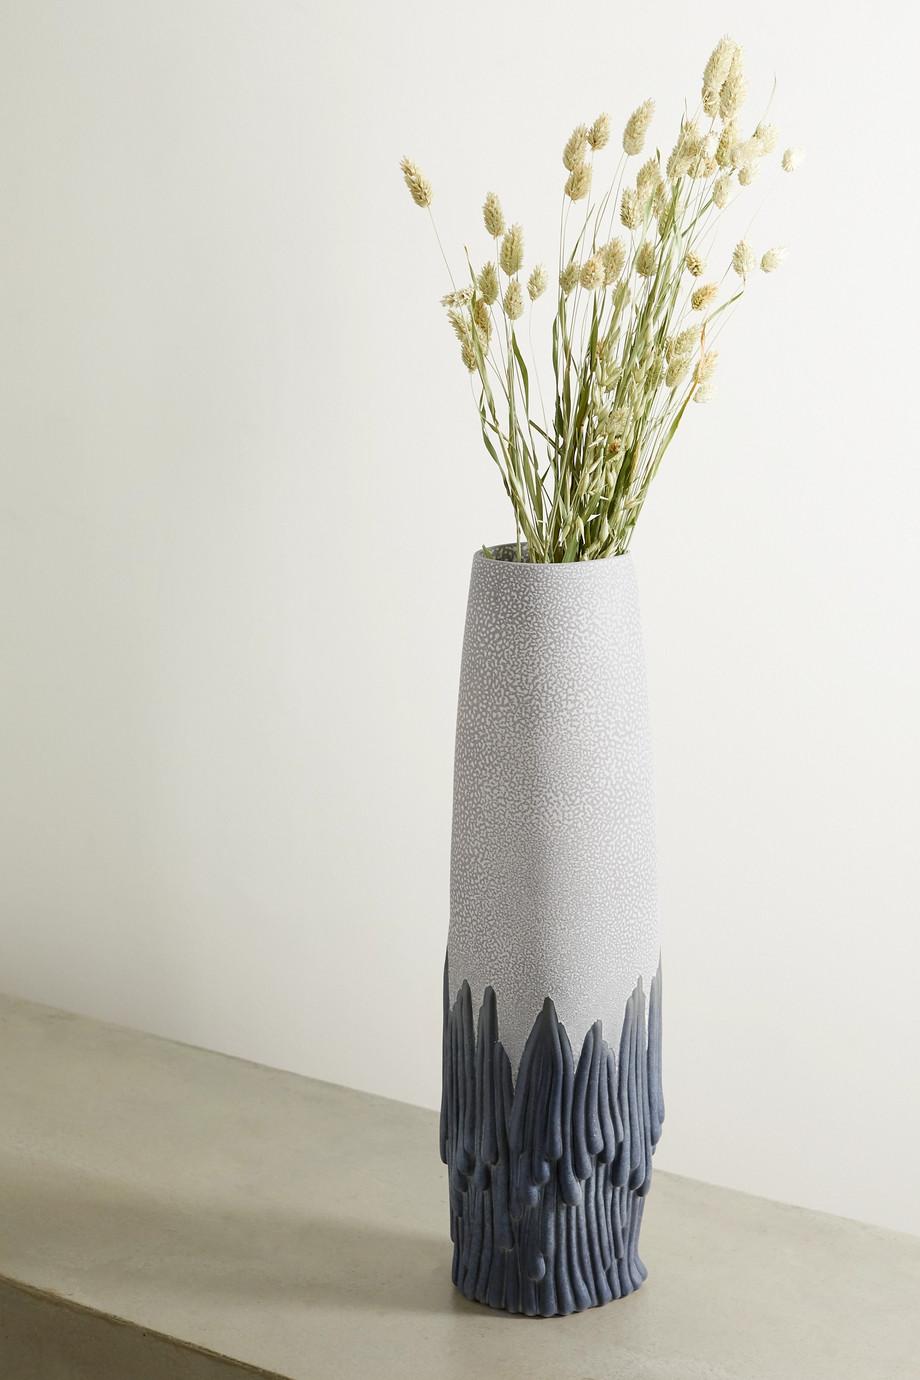 L'Objet + Haas Brothers Mojave mittelgroße Vase aus Ton